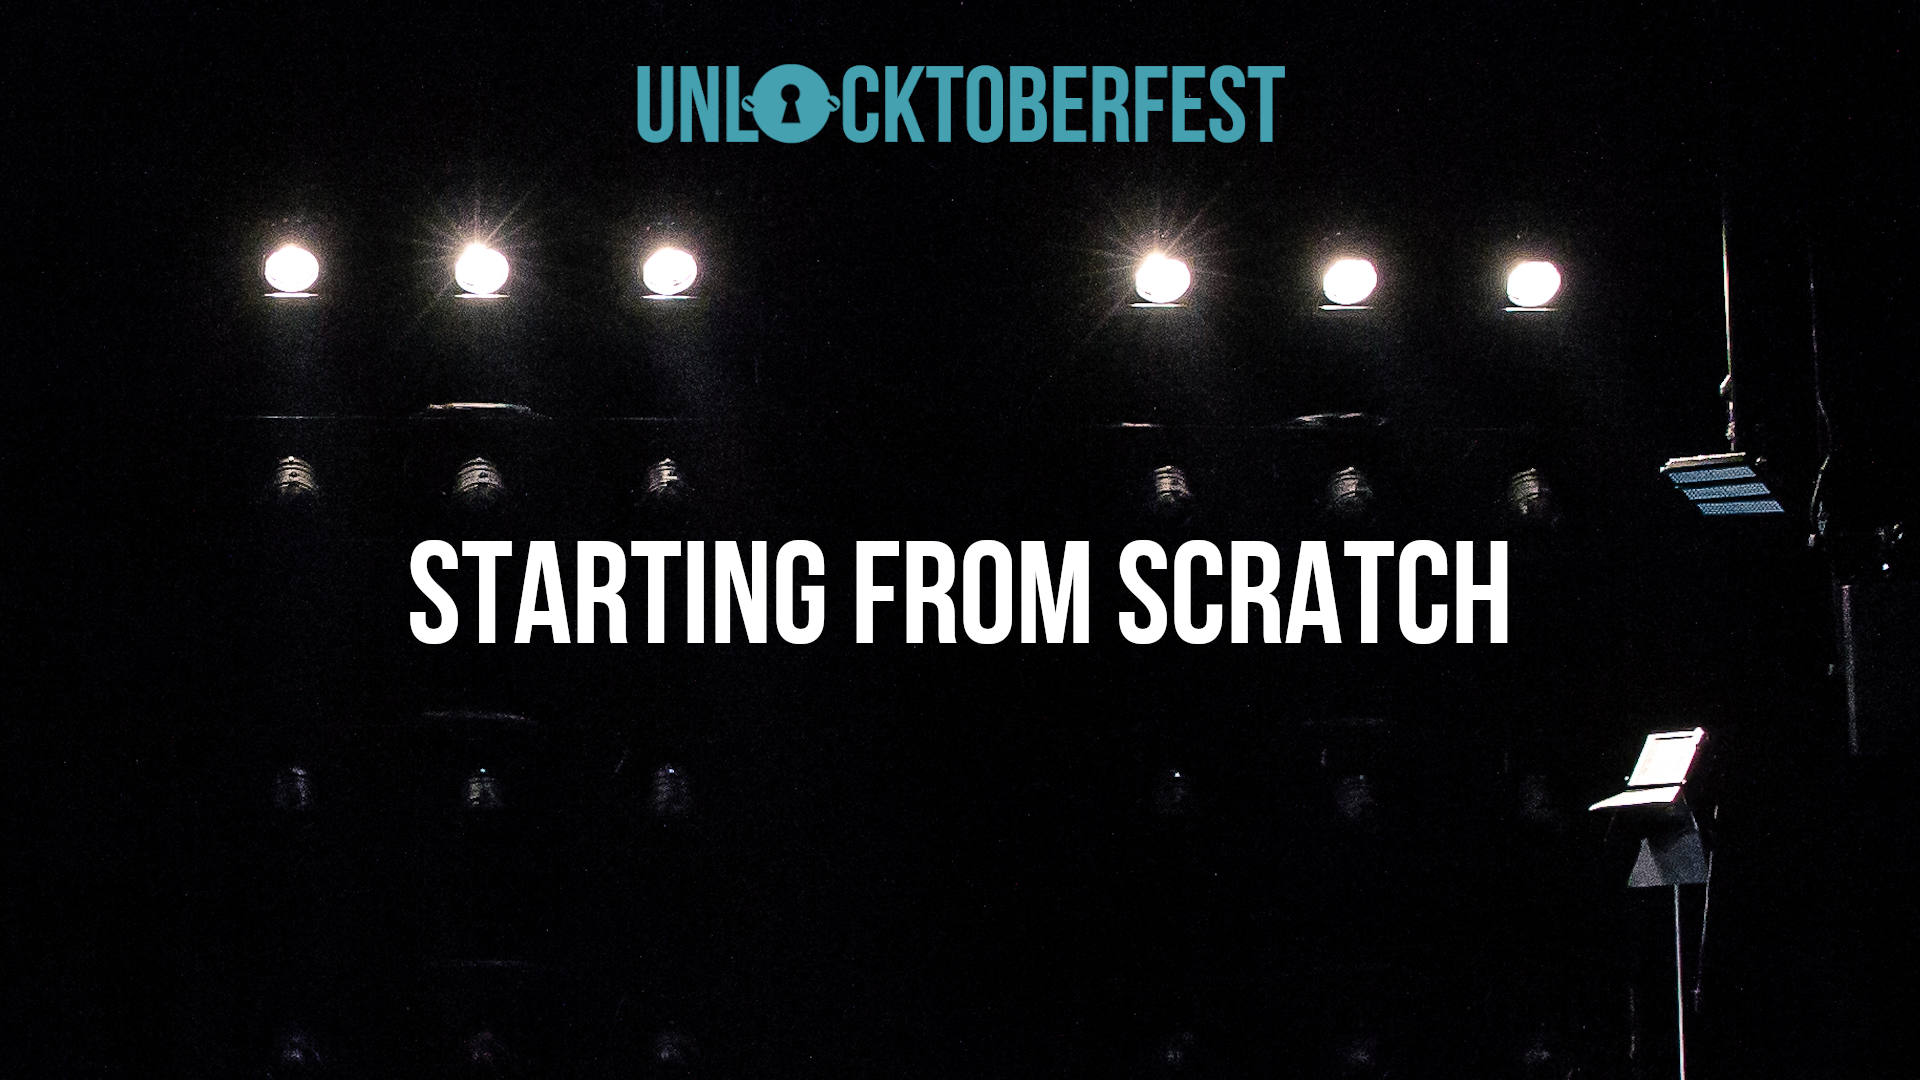 UNLOCKtoberfest Starting from Scratch